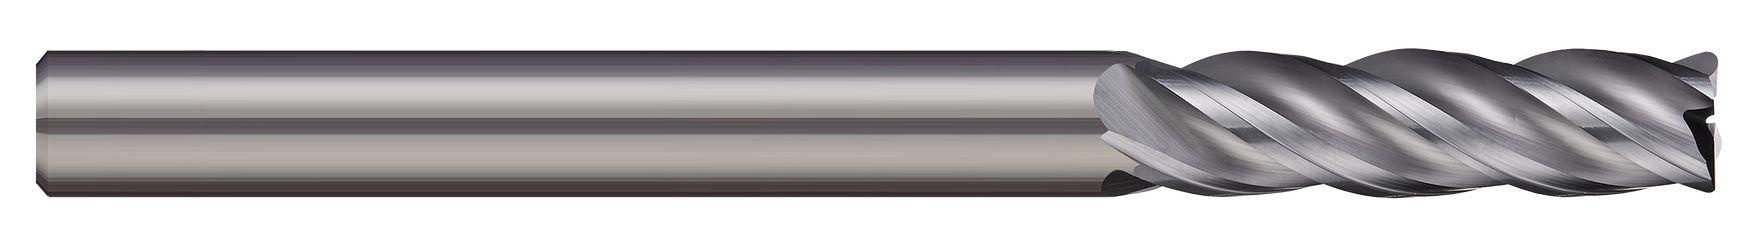 tool-details-VLM-250-4